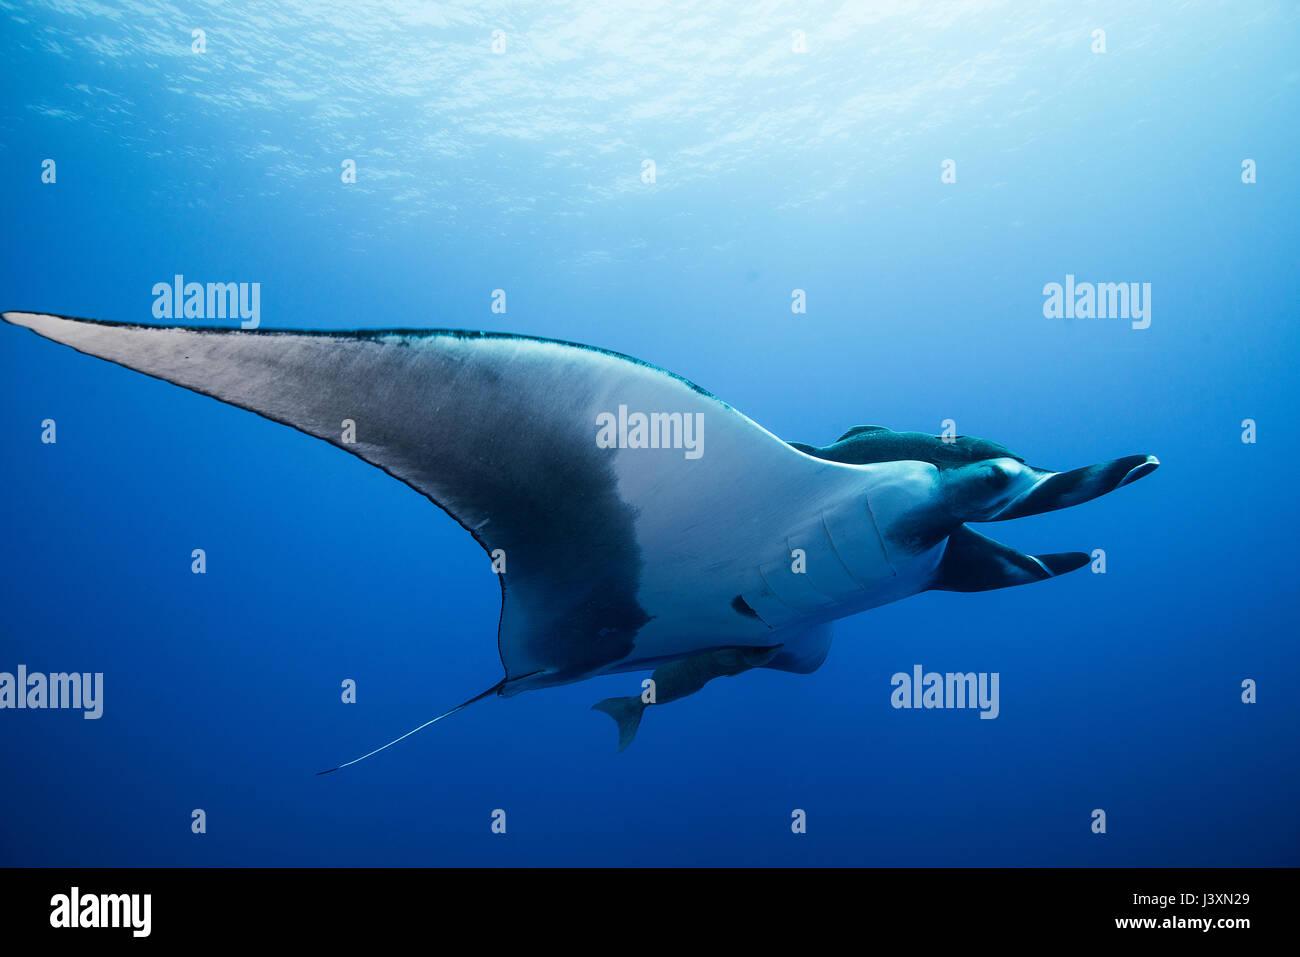 Giant Manta Ray (Manta birostris), underwater view,  Roca Partida, Colima, Mexico Stock Photo